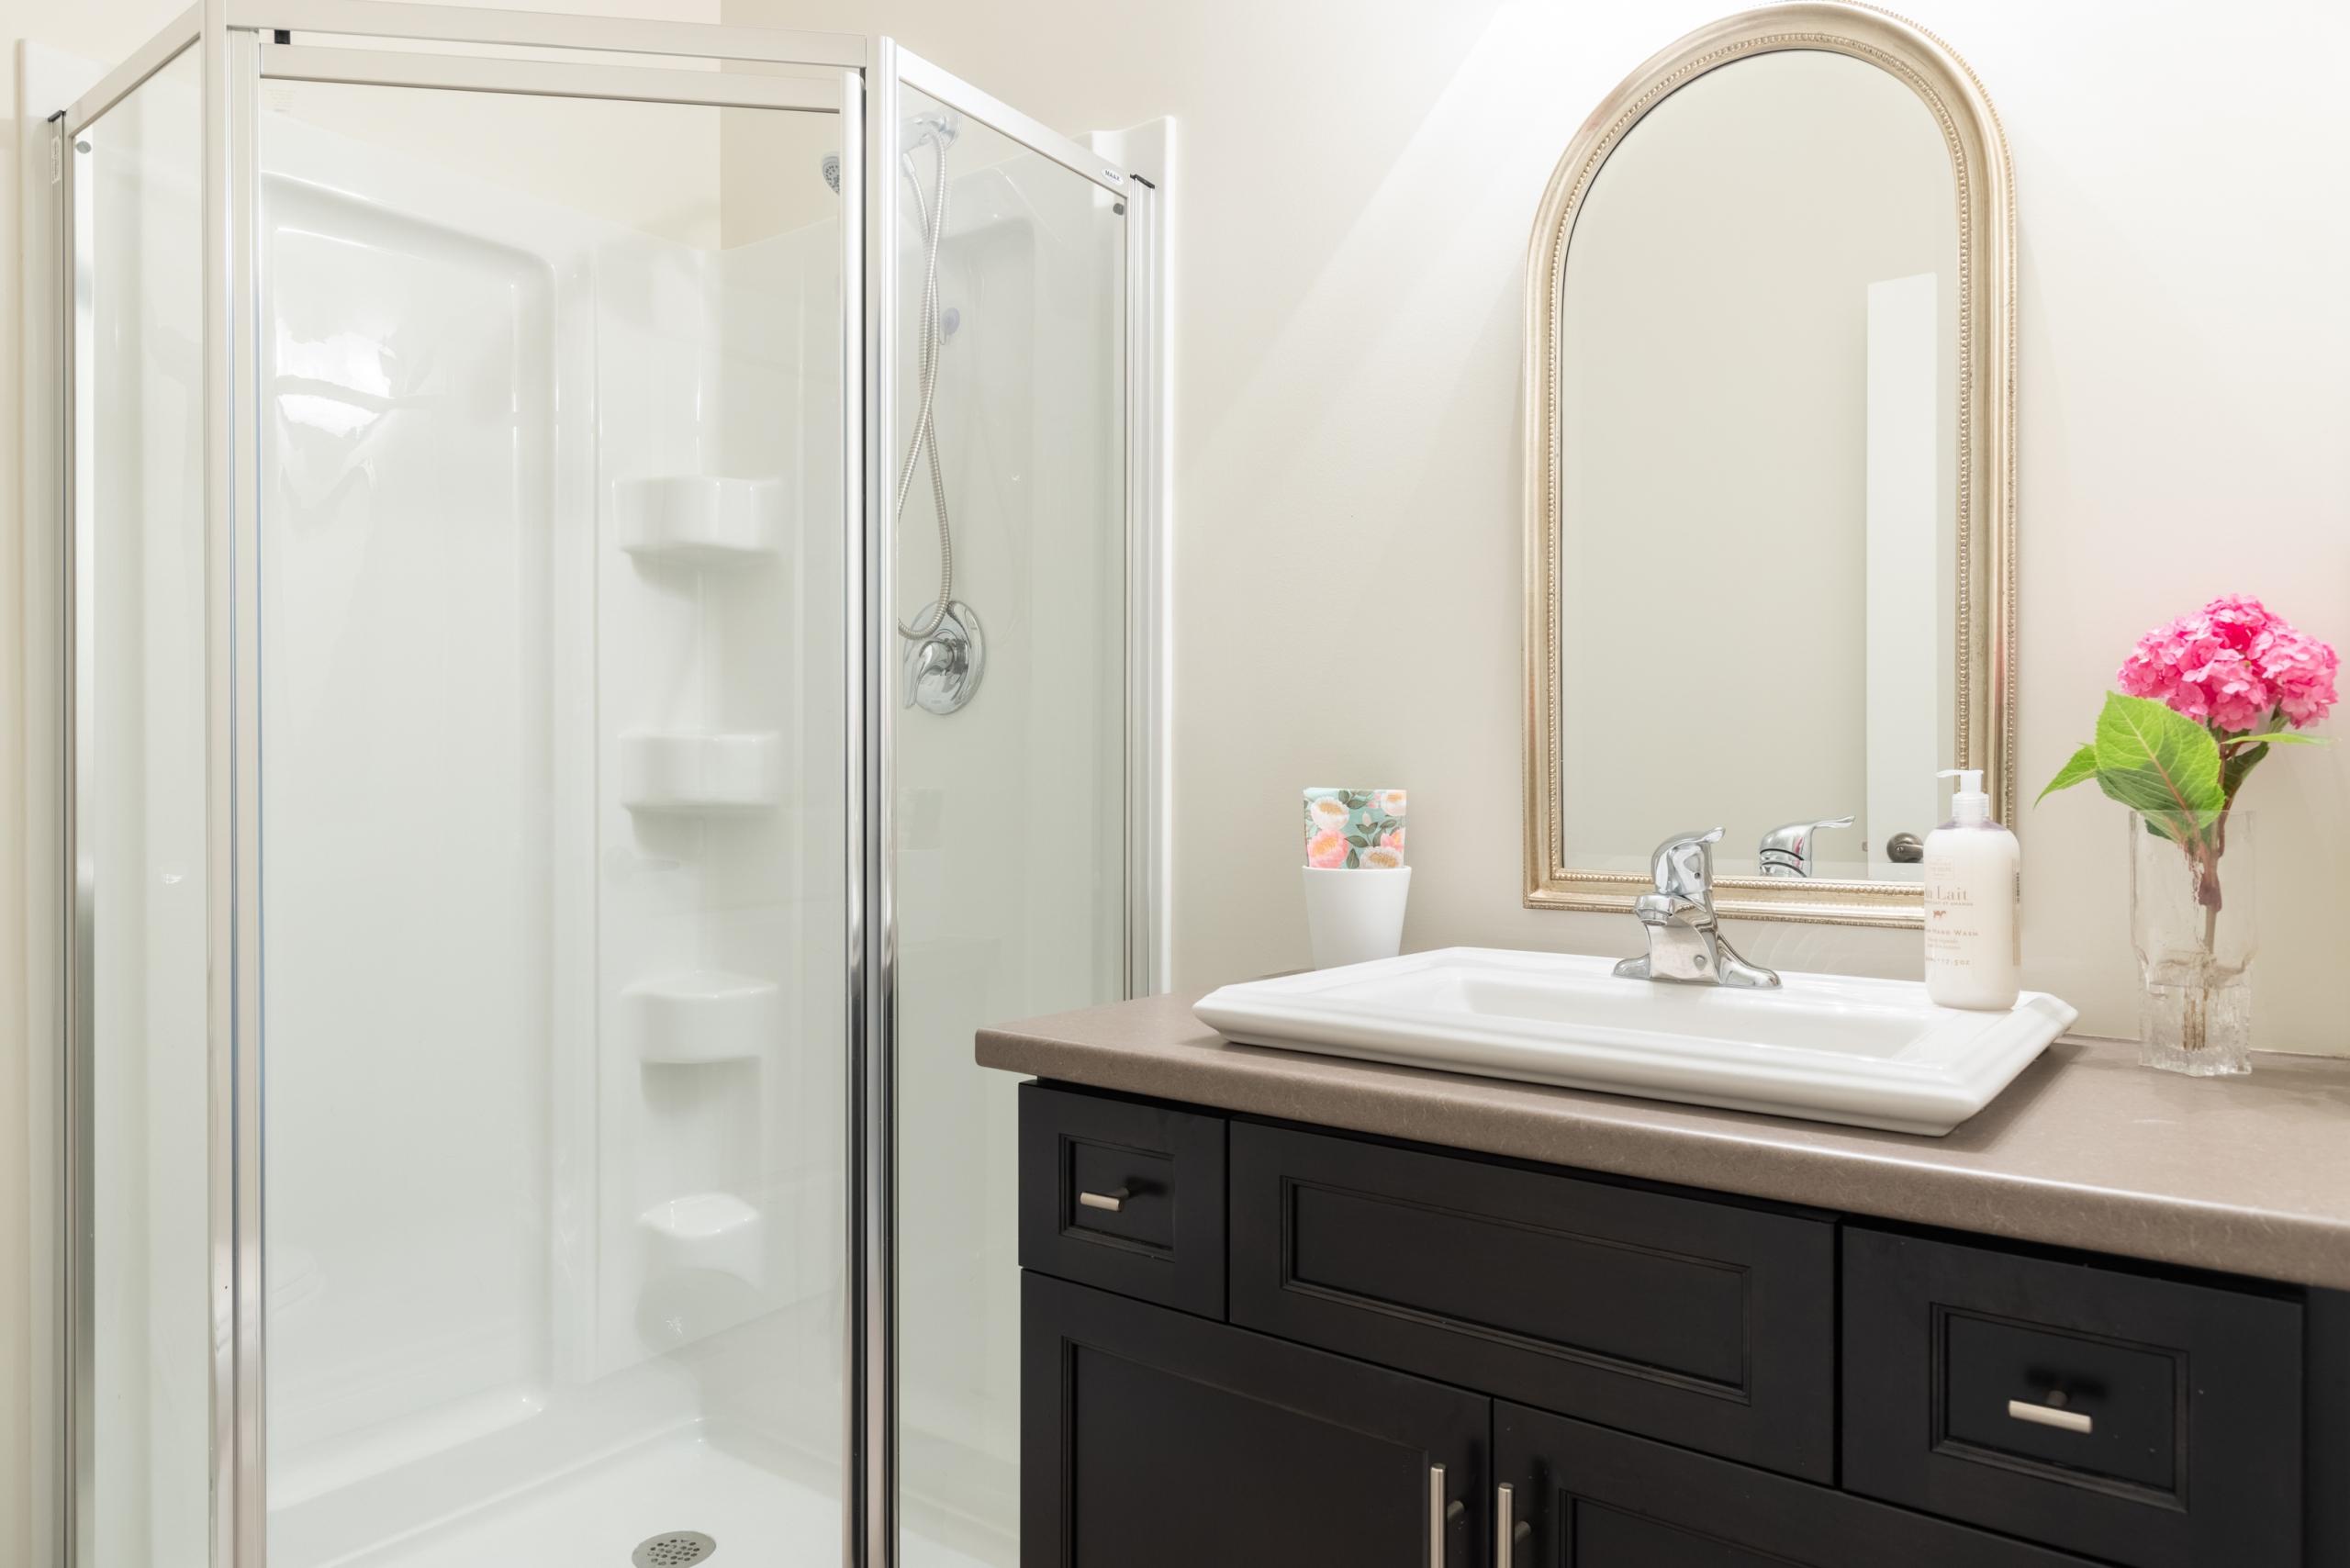 Bathroom featured at 7 Finton Lane, Binbrook, ON at Alex Irish & Associates